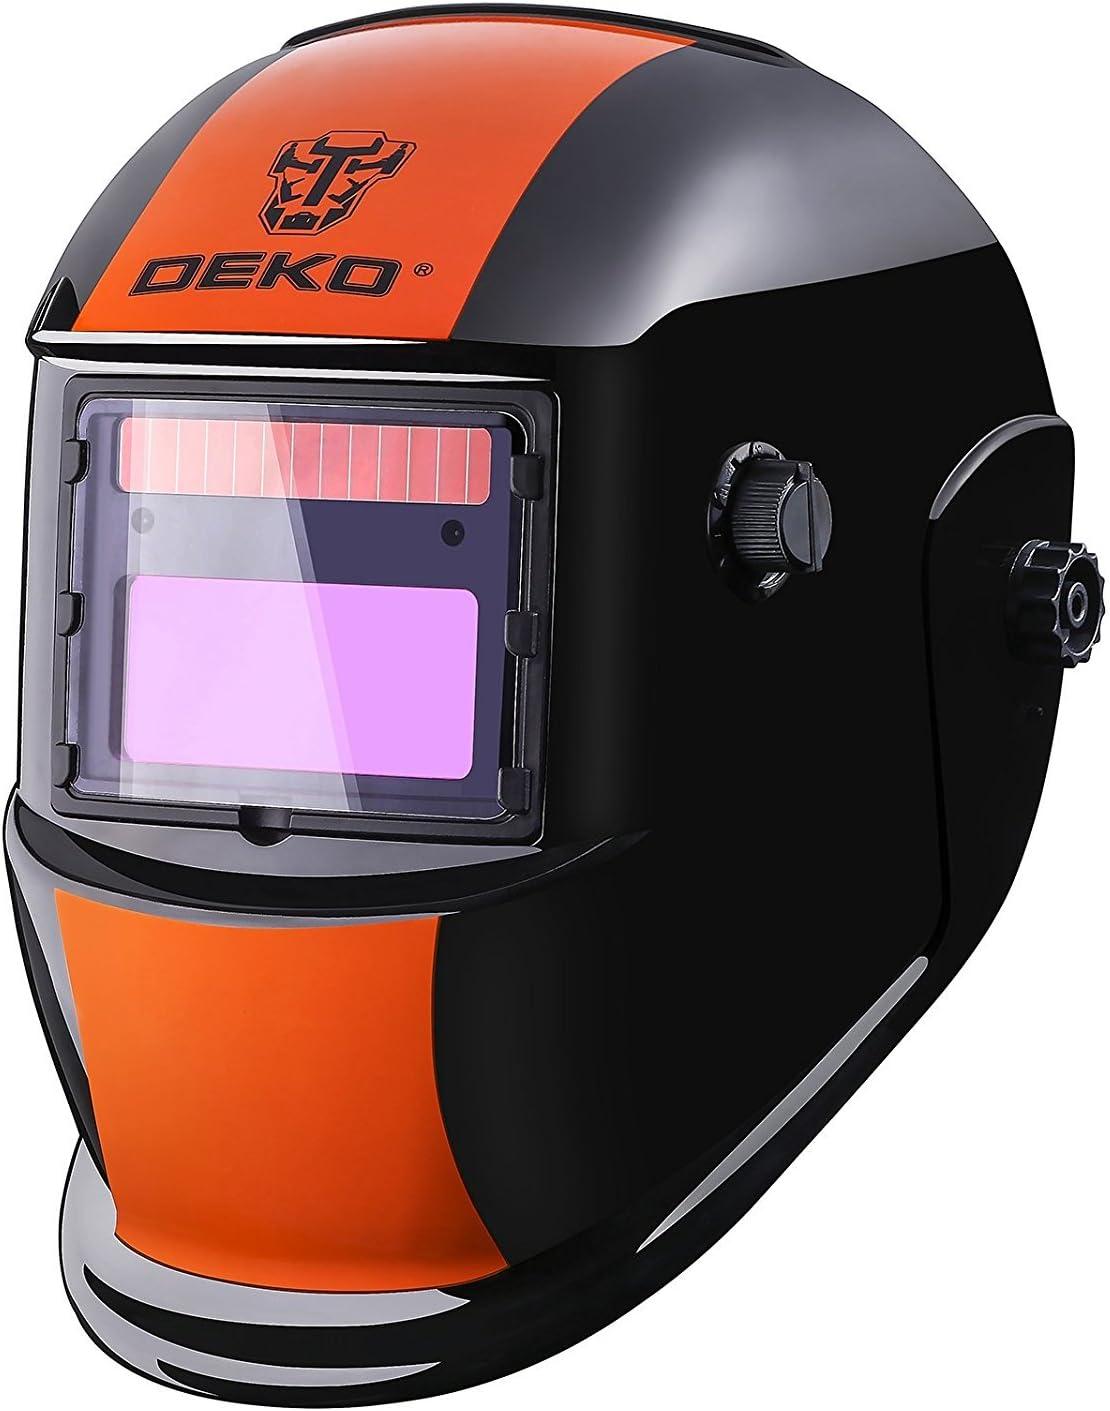 Auto Darkening Welding Helmet for Mig Tig Arc Welder